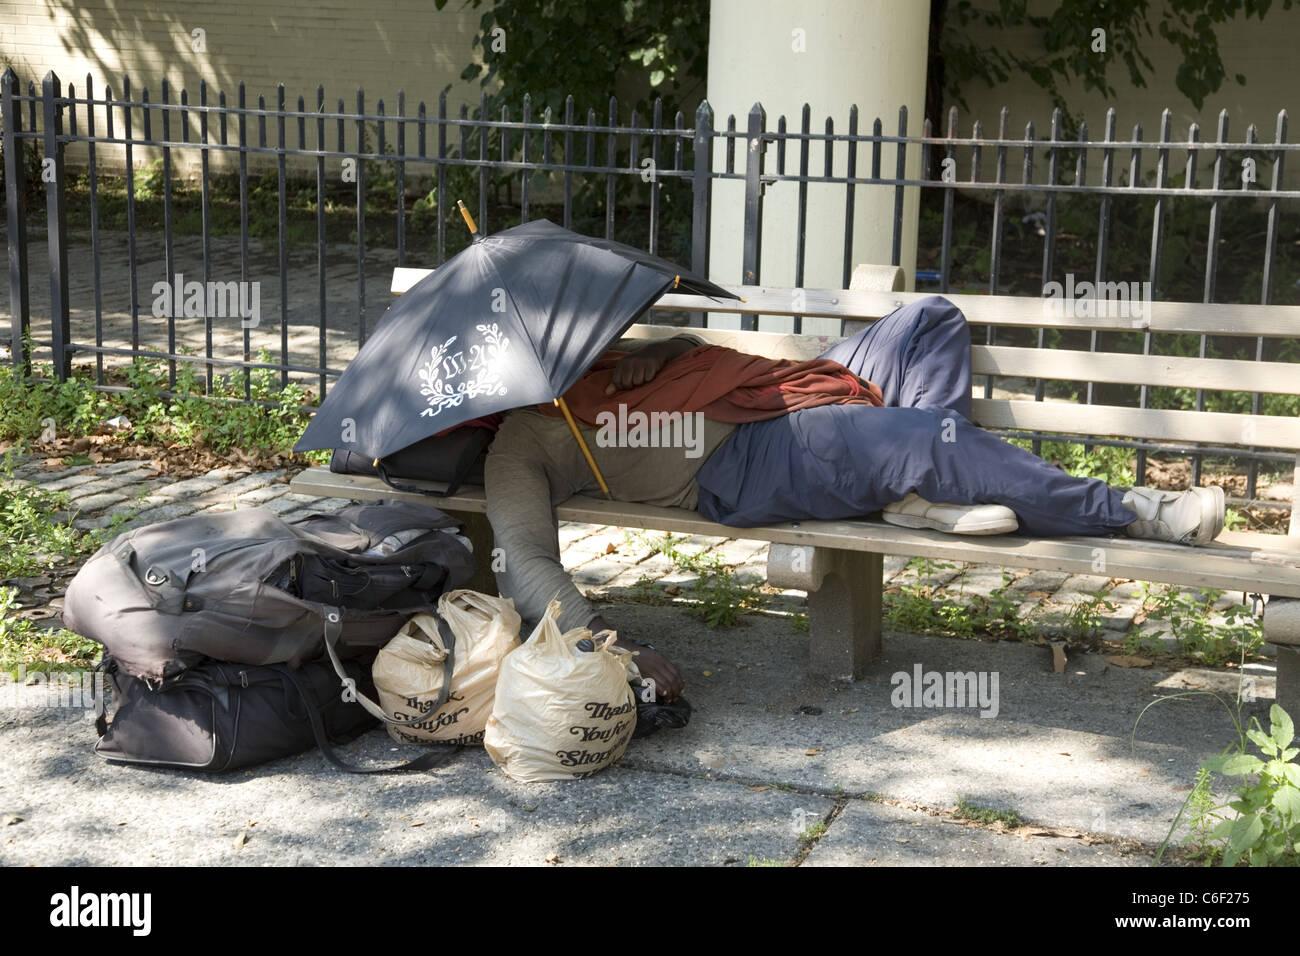 homeless; homelessness; man; sleeping; bench; alone; outside; belongings; Brooklyn; New York City; NYC; USA; America - Stock Image